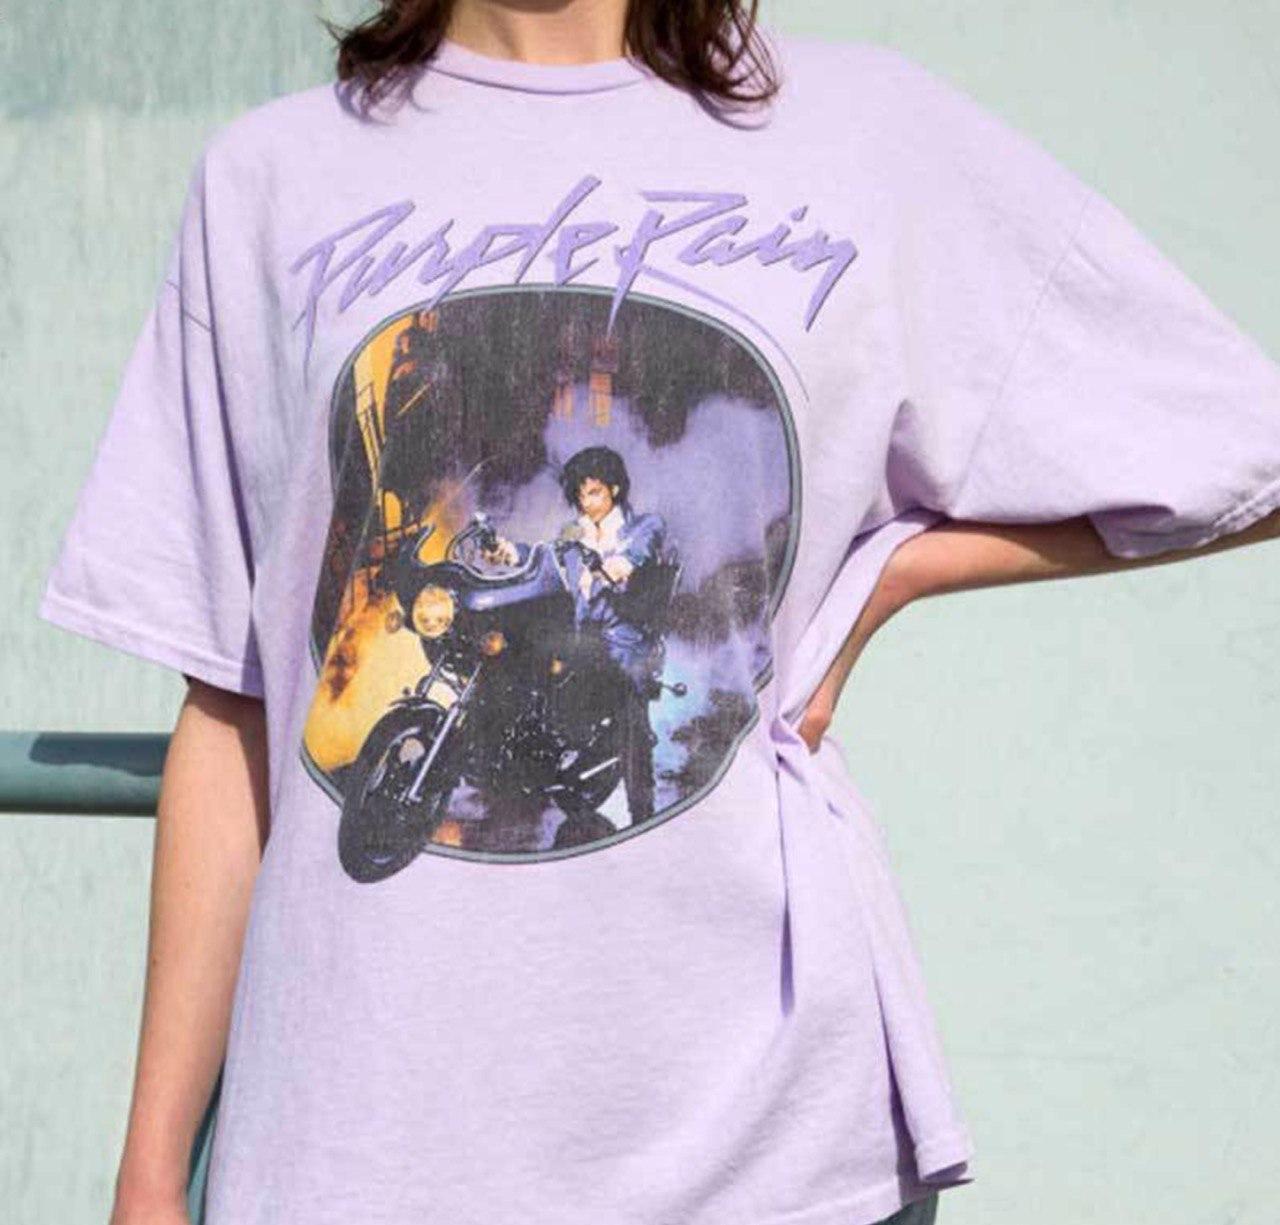 Vintage T shirt 13USD